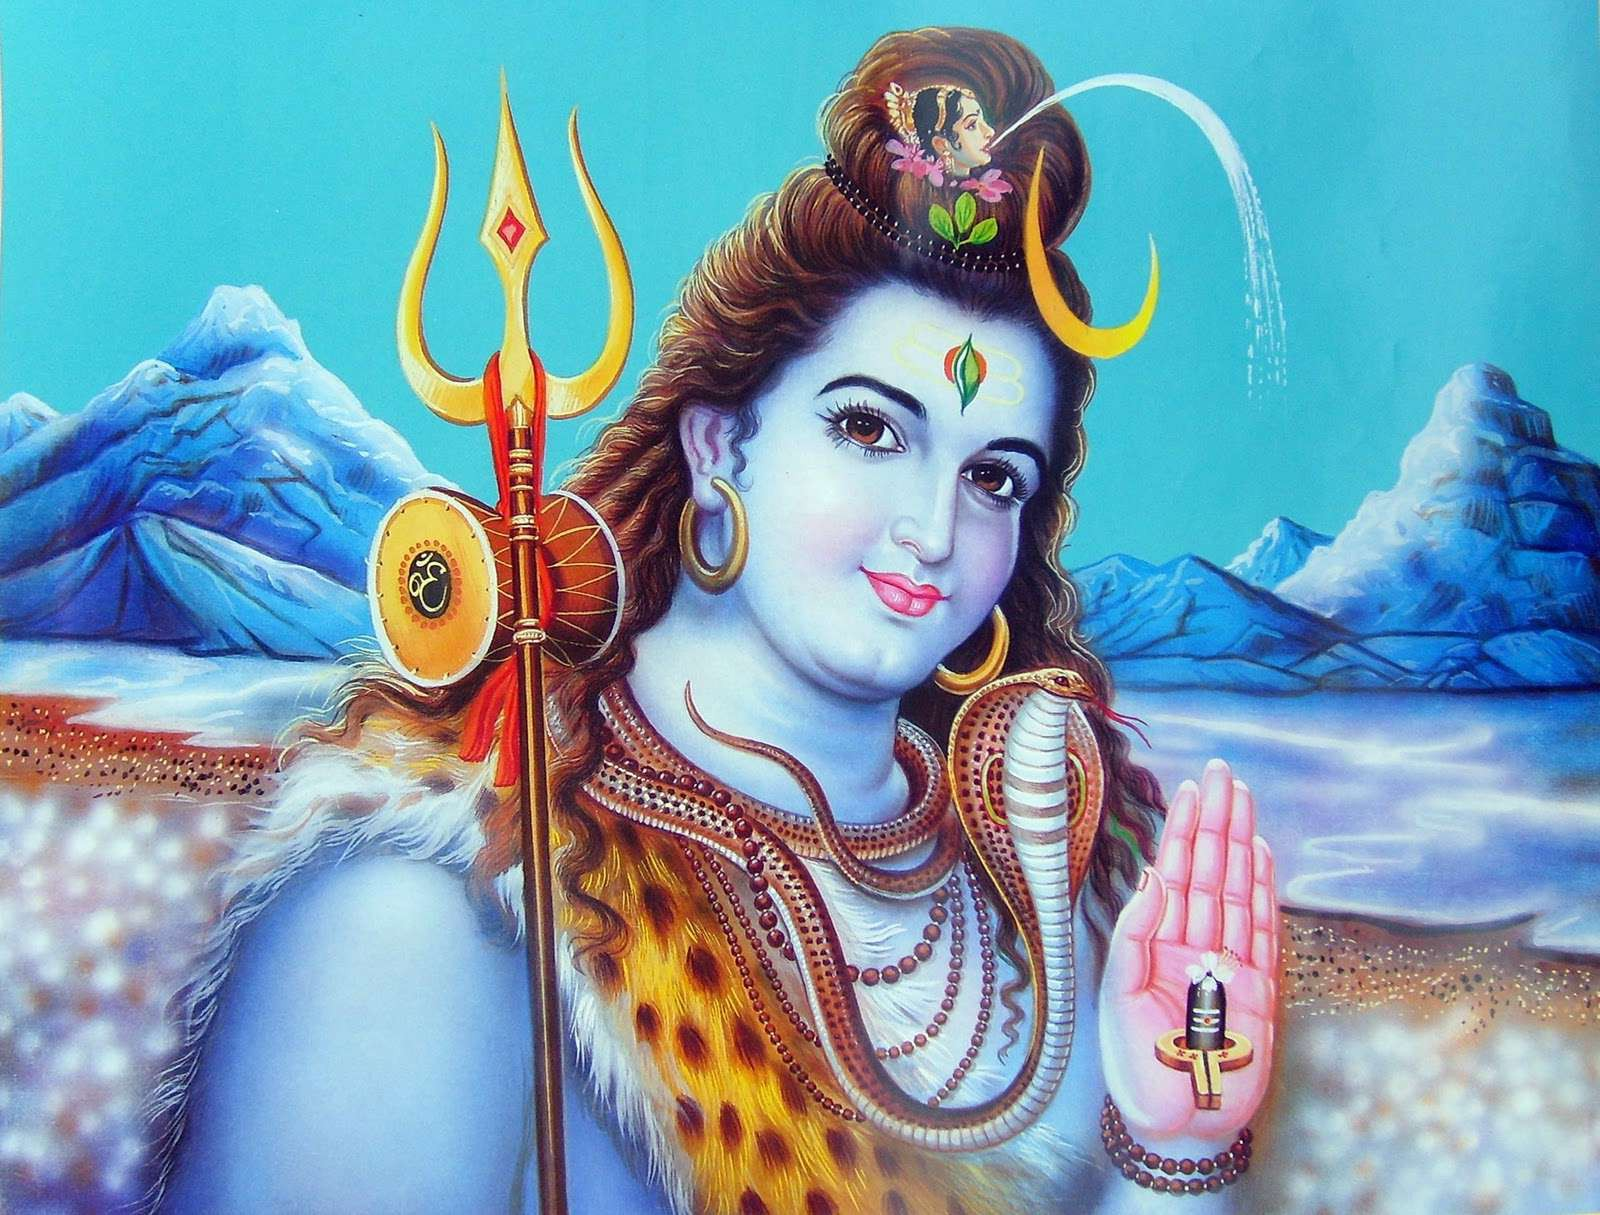 Pramukh Swami 3d Wallpaper Jay Swaminarayan Wallpapers August 2013